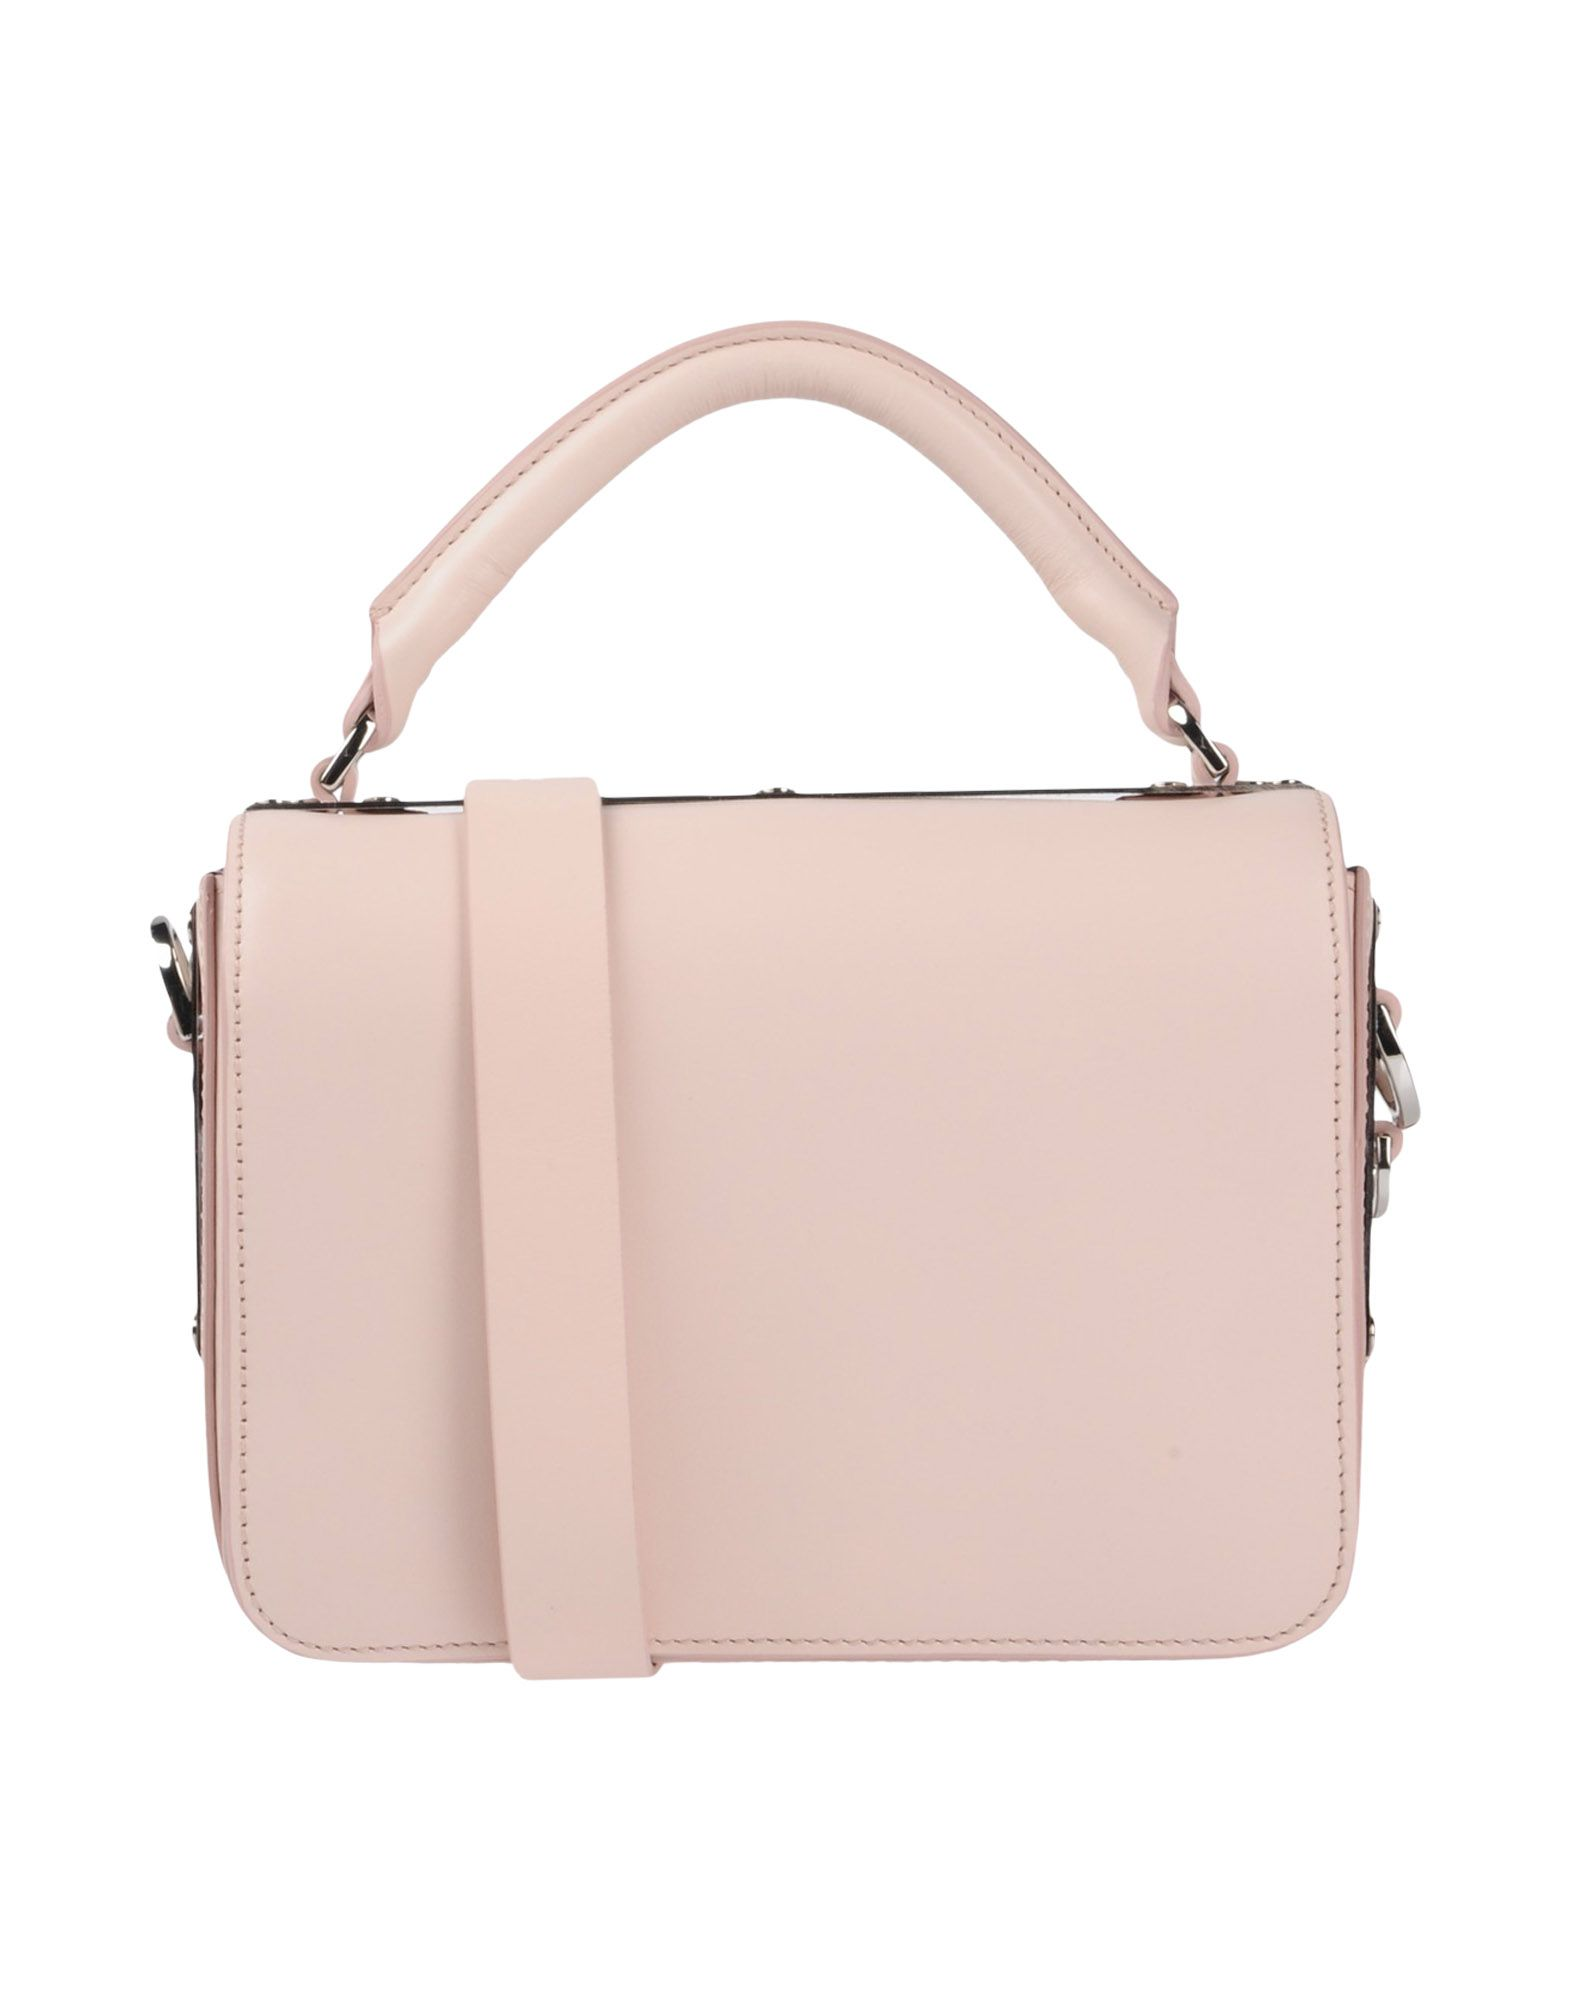 Sophie Hulme Handbags In Light Pink  166cc2e68484b